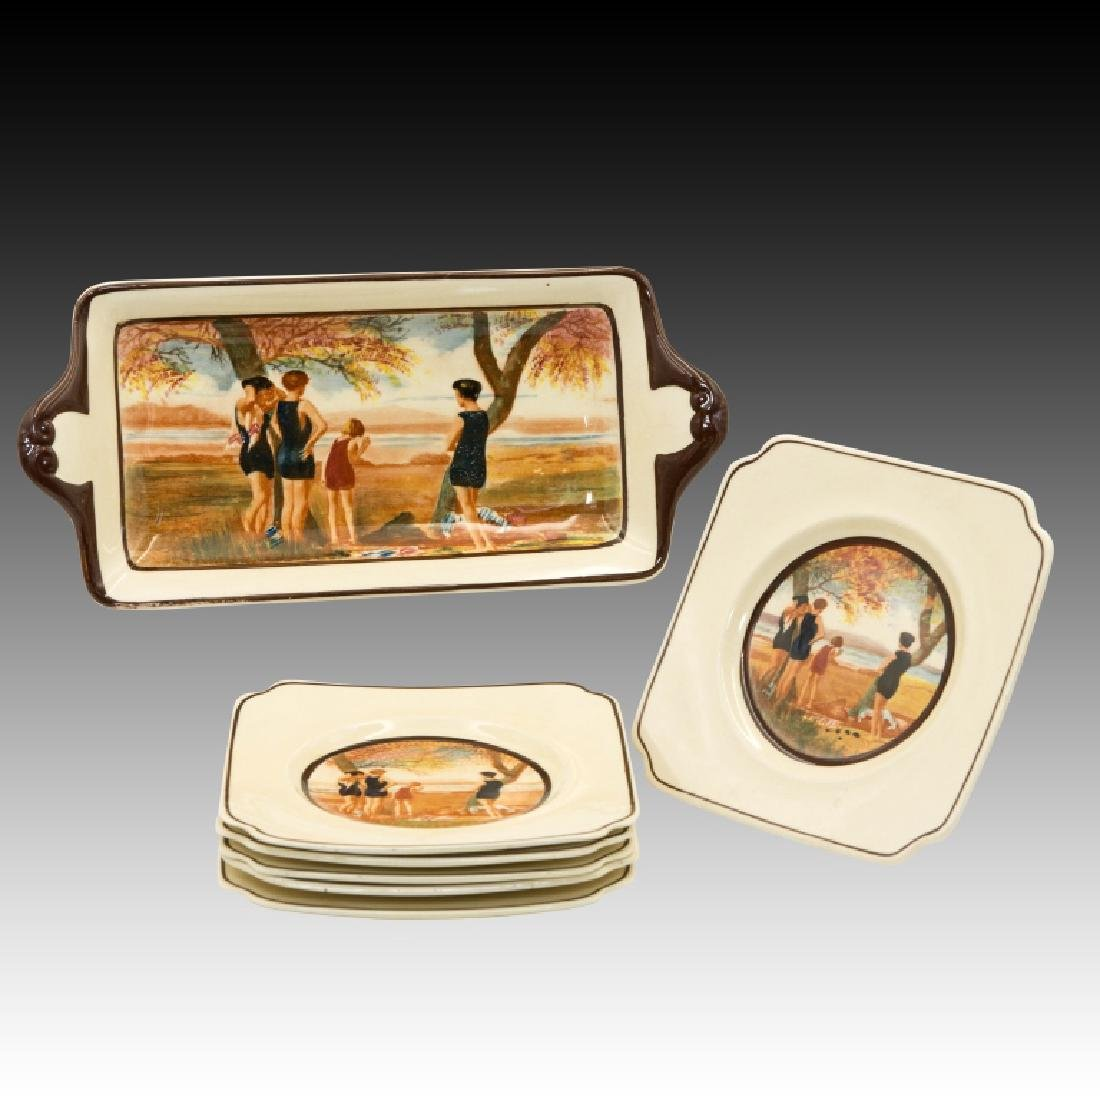 Royal Doulton Sandwich Set Surfing Design - 2